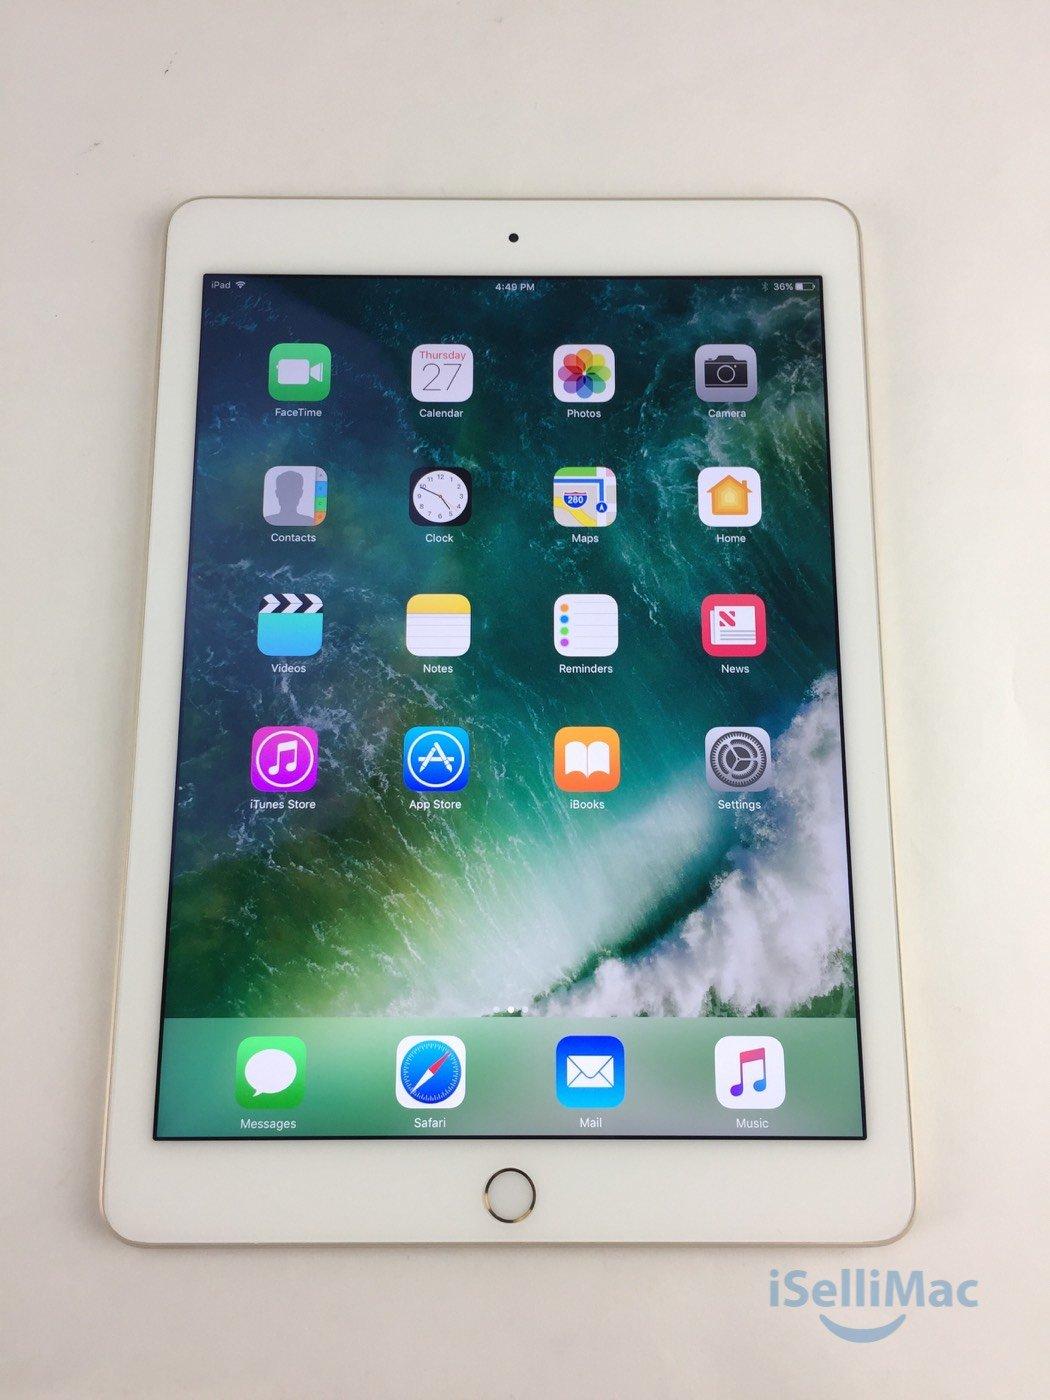 Apple IPad Air WiFi 64GB Gold FH182C/A + B Grade + Accessories + AppleCare+!